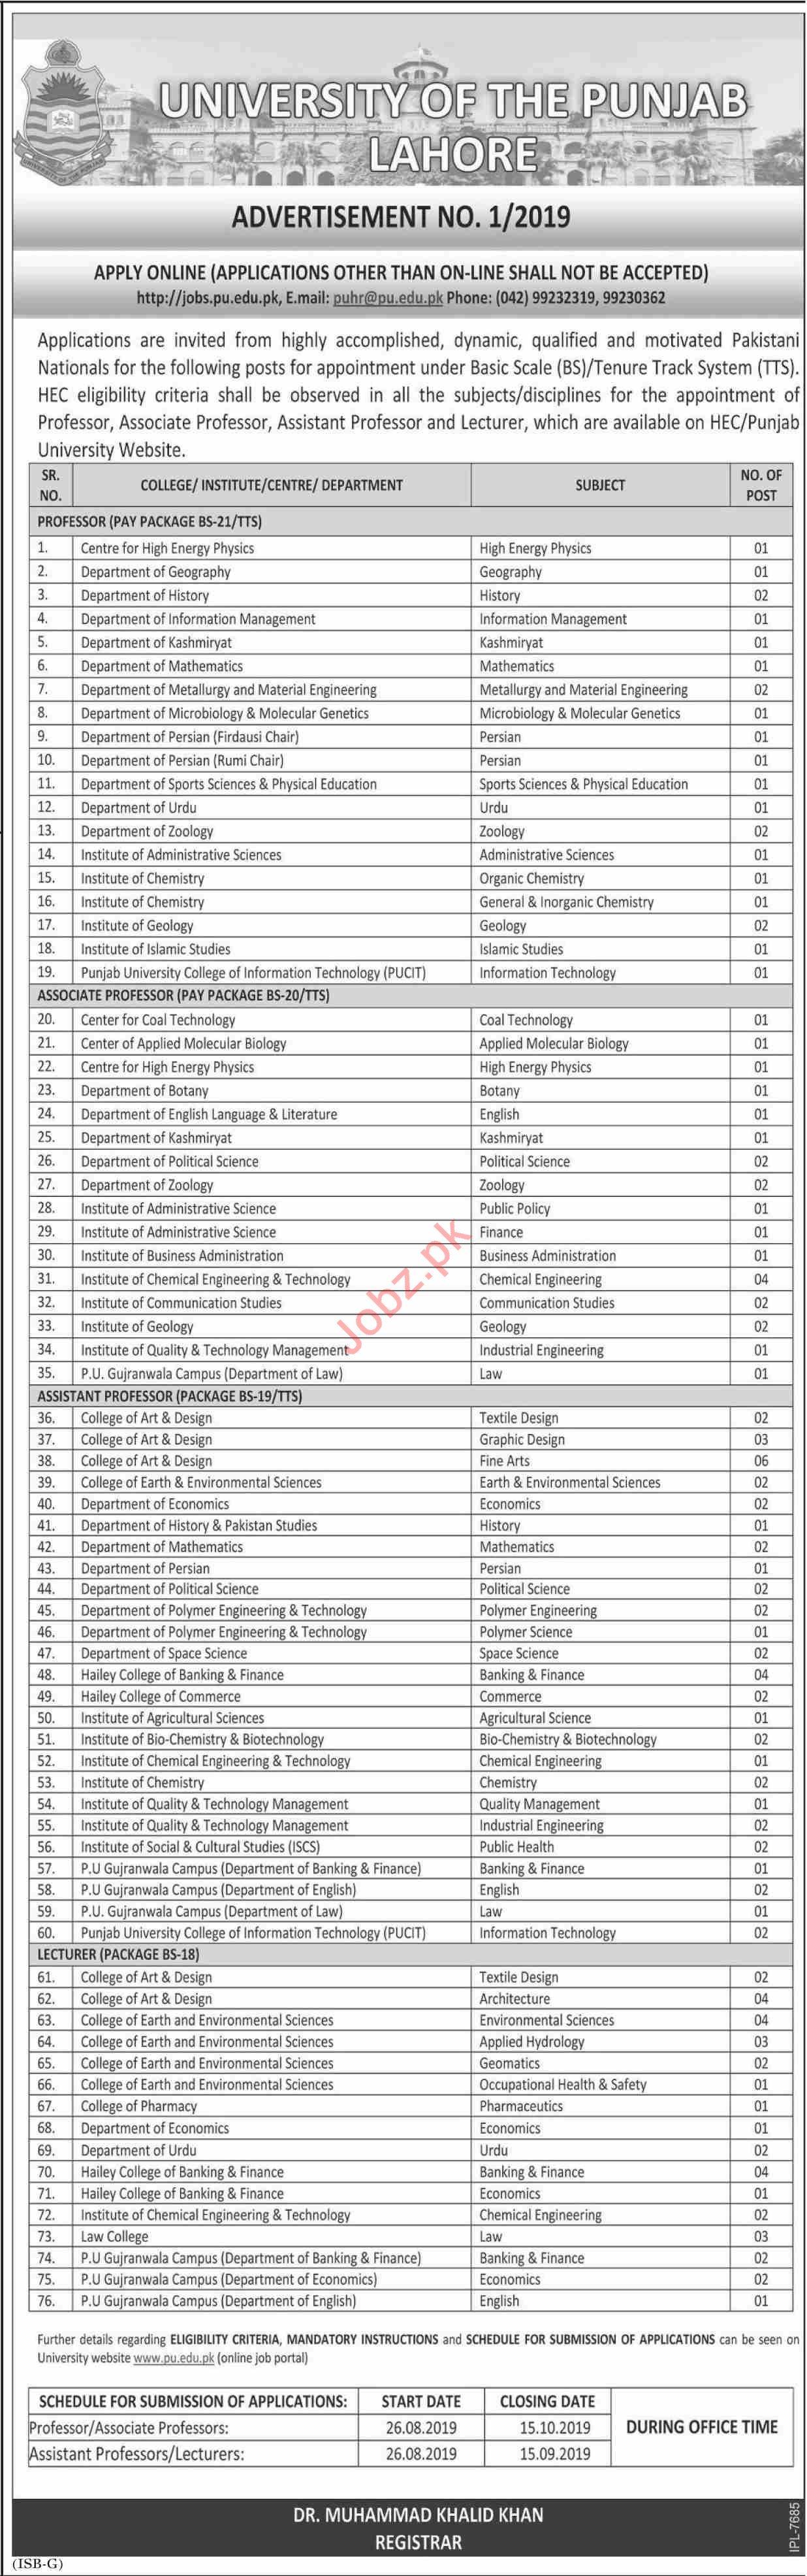 University of the Punjab PU Lahore Jobs for Professors